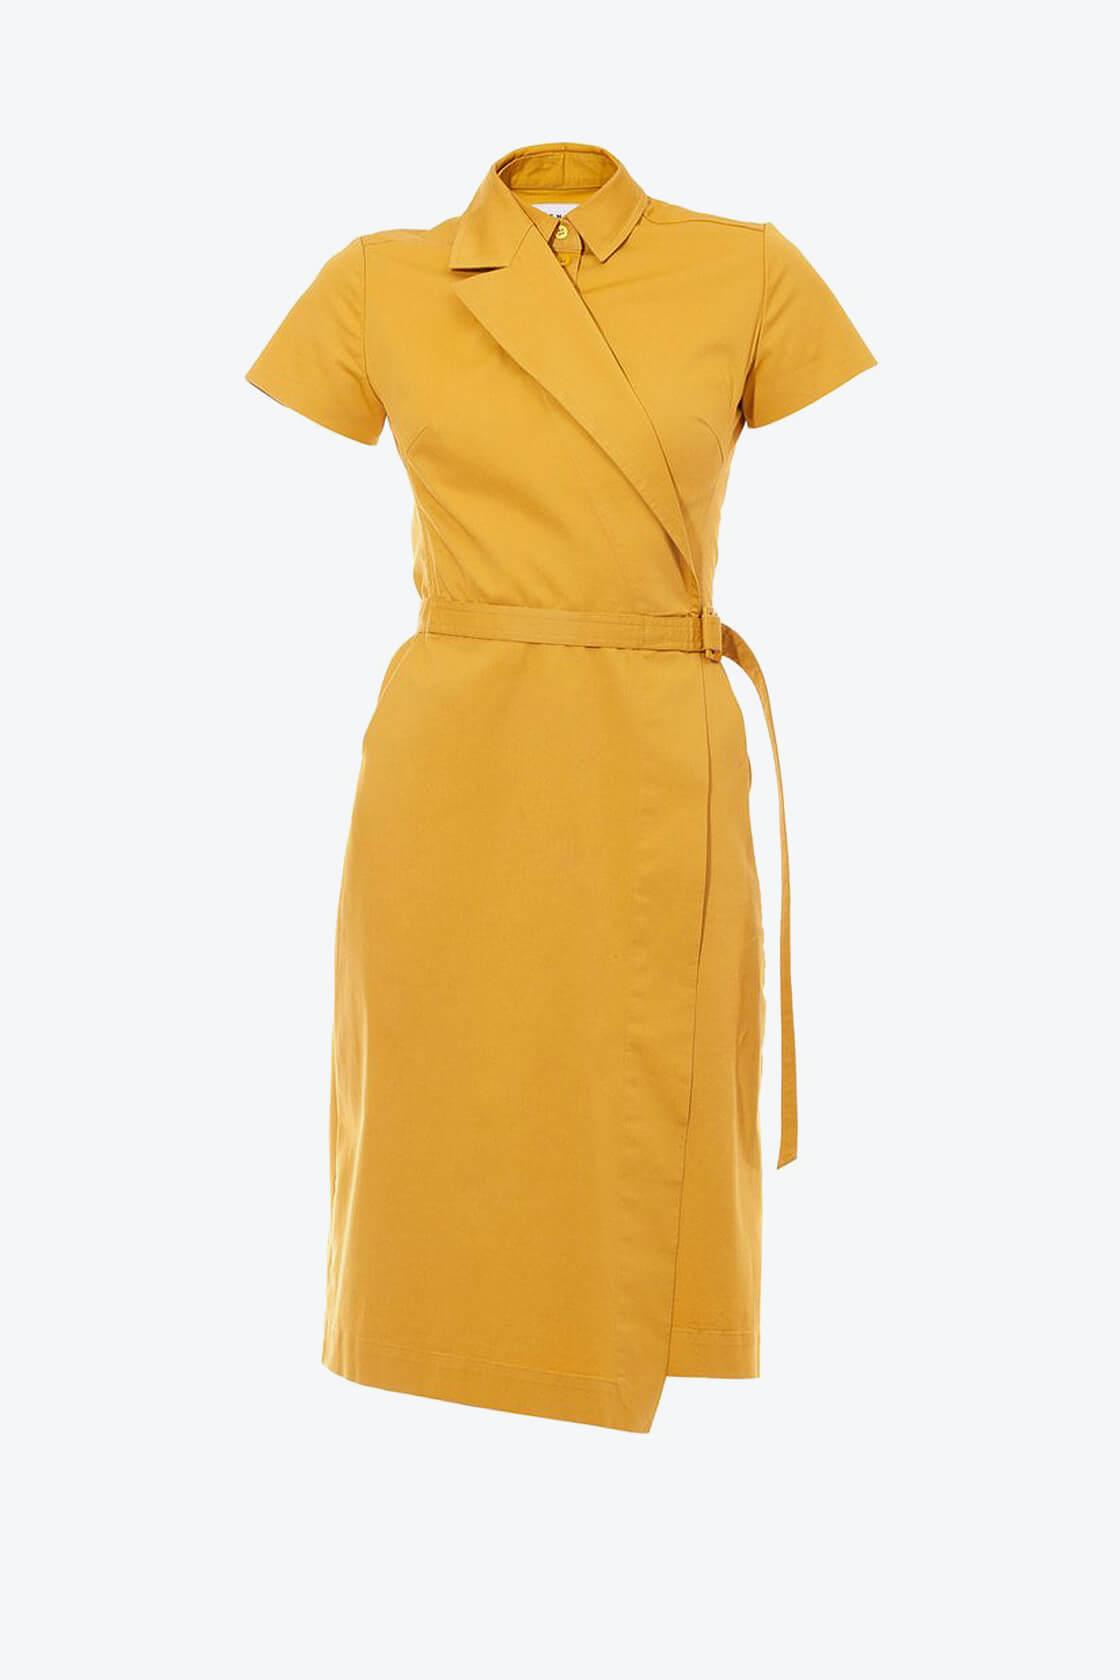 OL10000202 Asymmetric blazer dress1